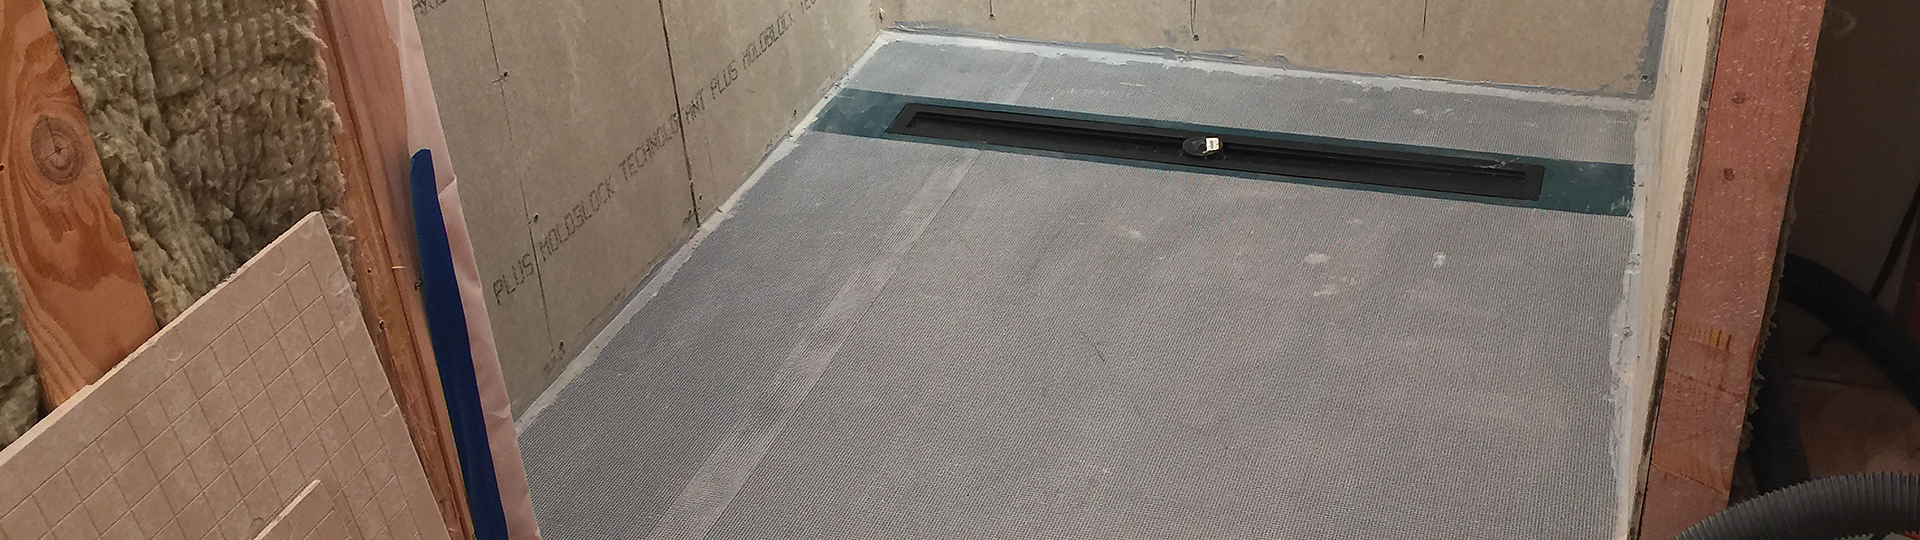 Linear Drain ShowerSlope™ | KBRS Shower Systems